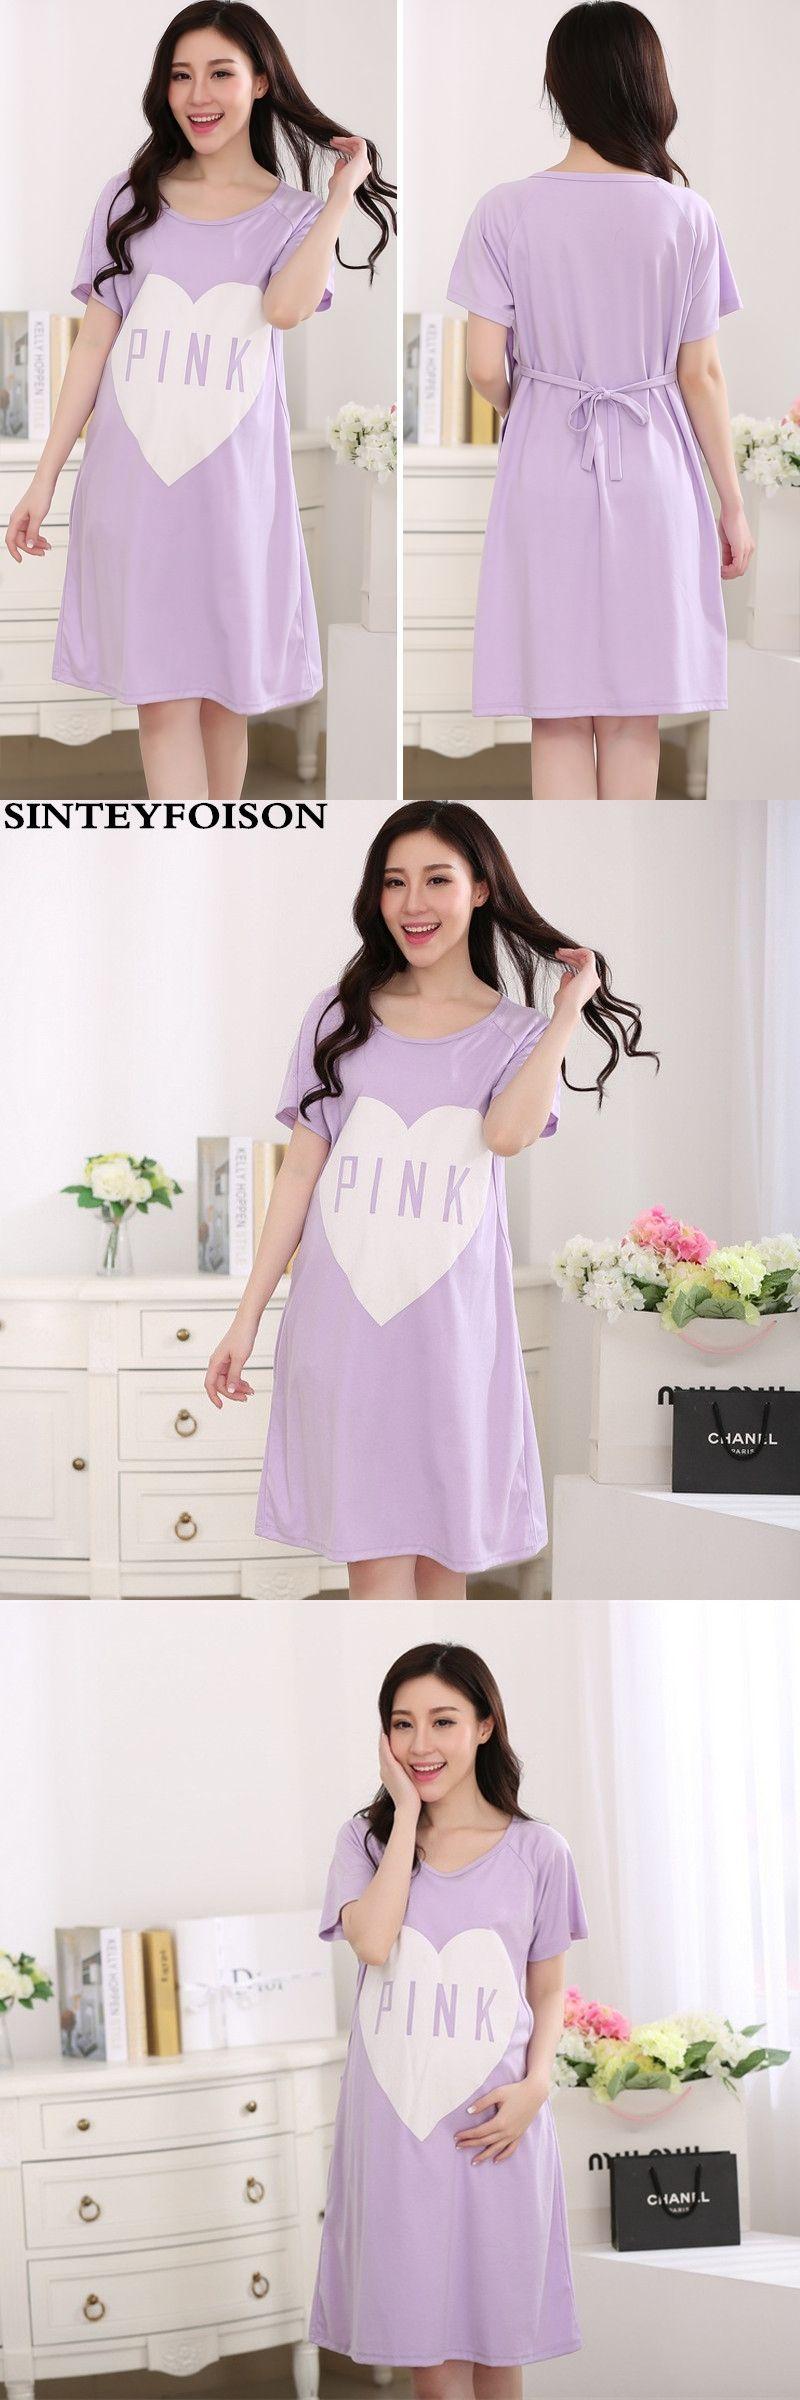 ac9ed1f18c SpringSummer Expectant Mother Feeding Dress Letter PINK Pregnant Women  Pajamas with Short Sleeves Thin Cotton Nursing